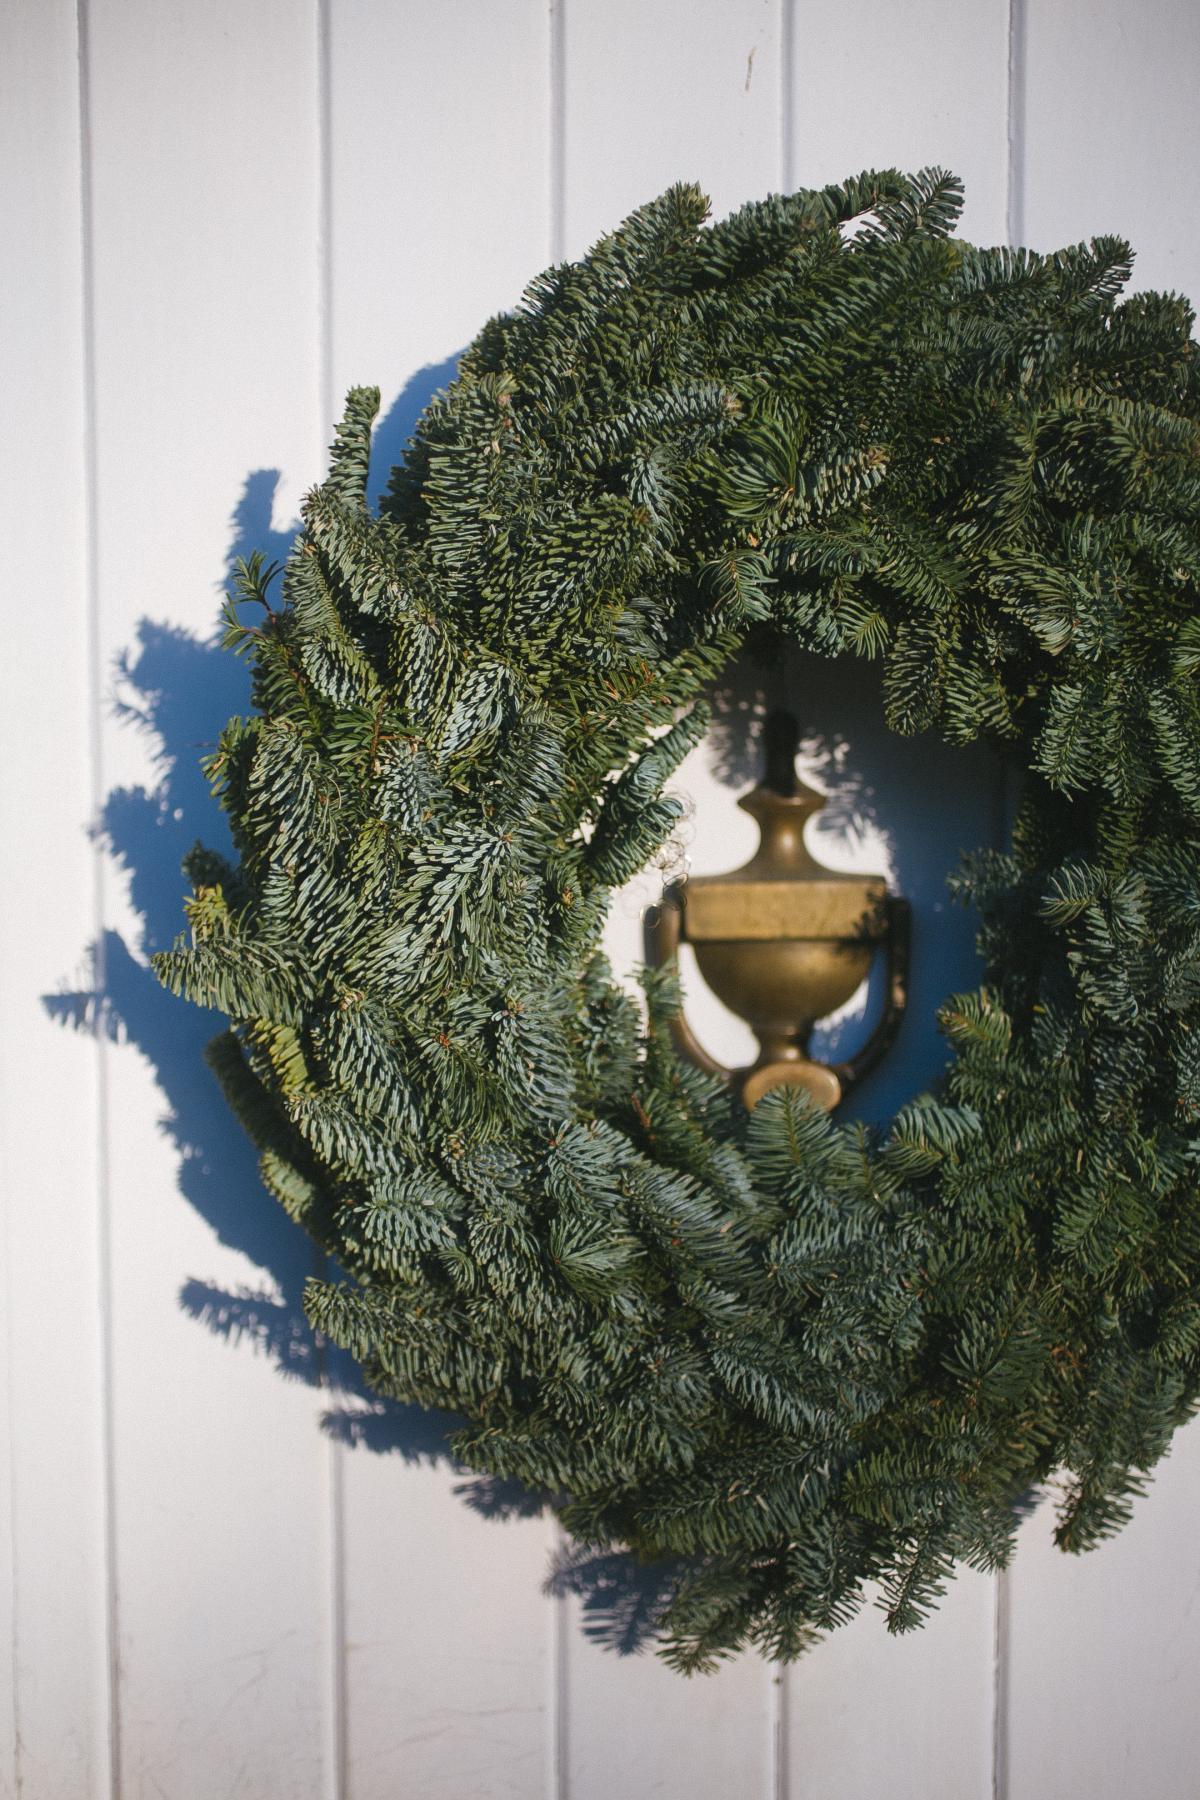 Decoration Tree Ornament